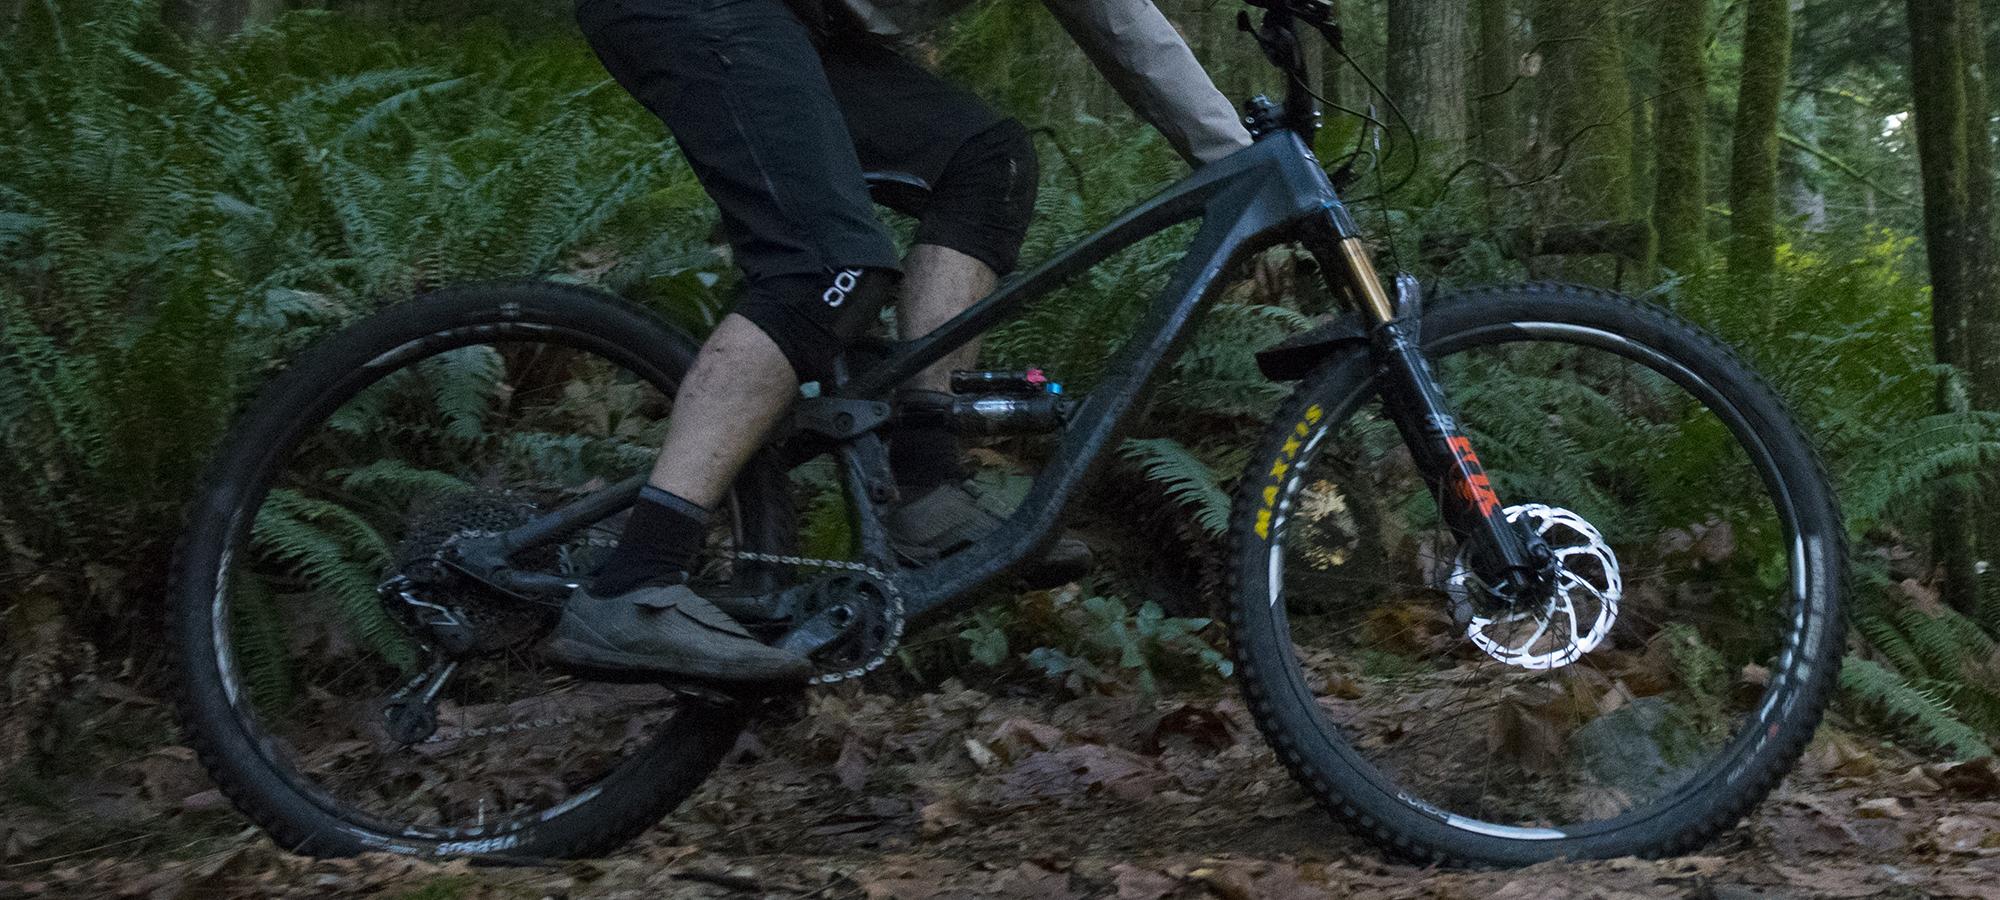 David Golay reviews the Sun Ringlé Duroc SD37 Pro wheelset for Blister